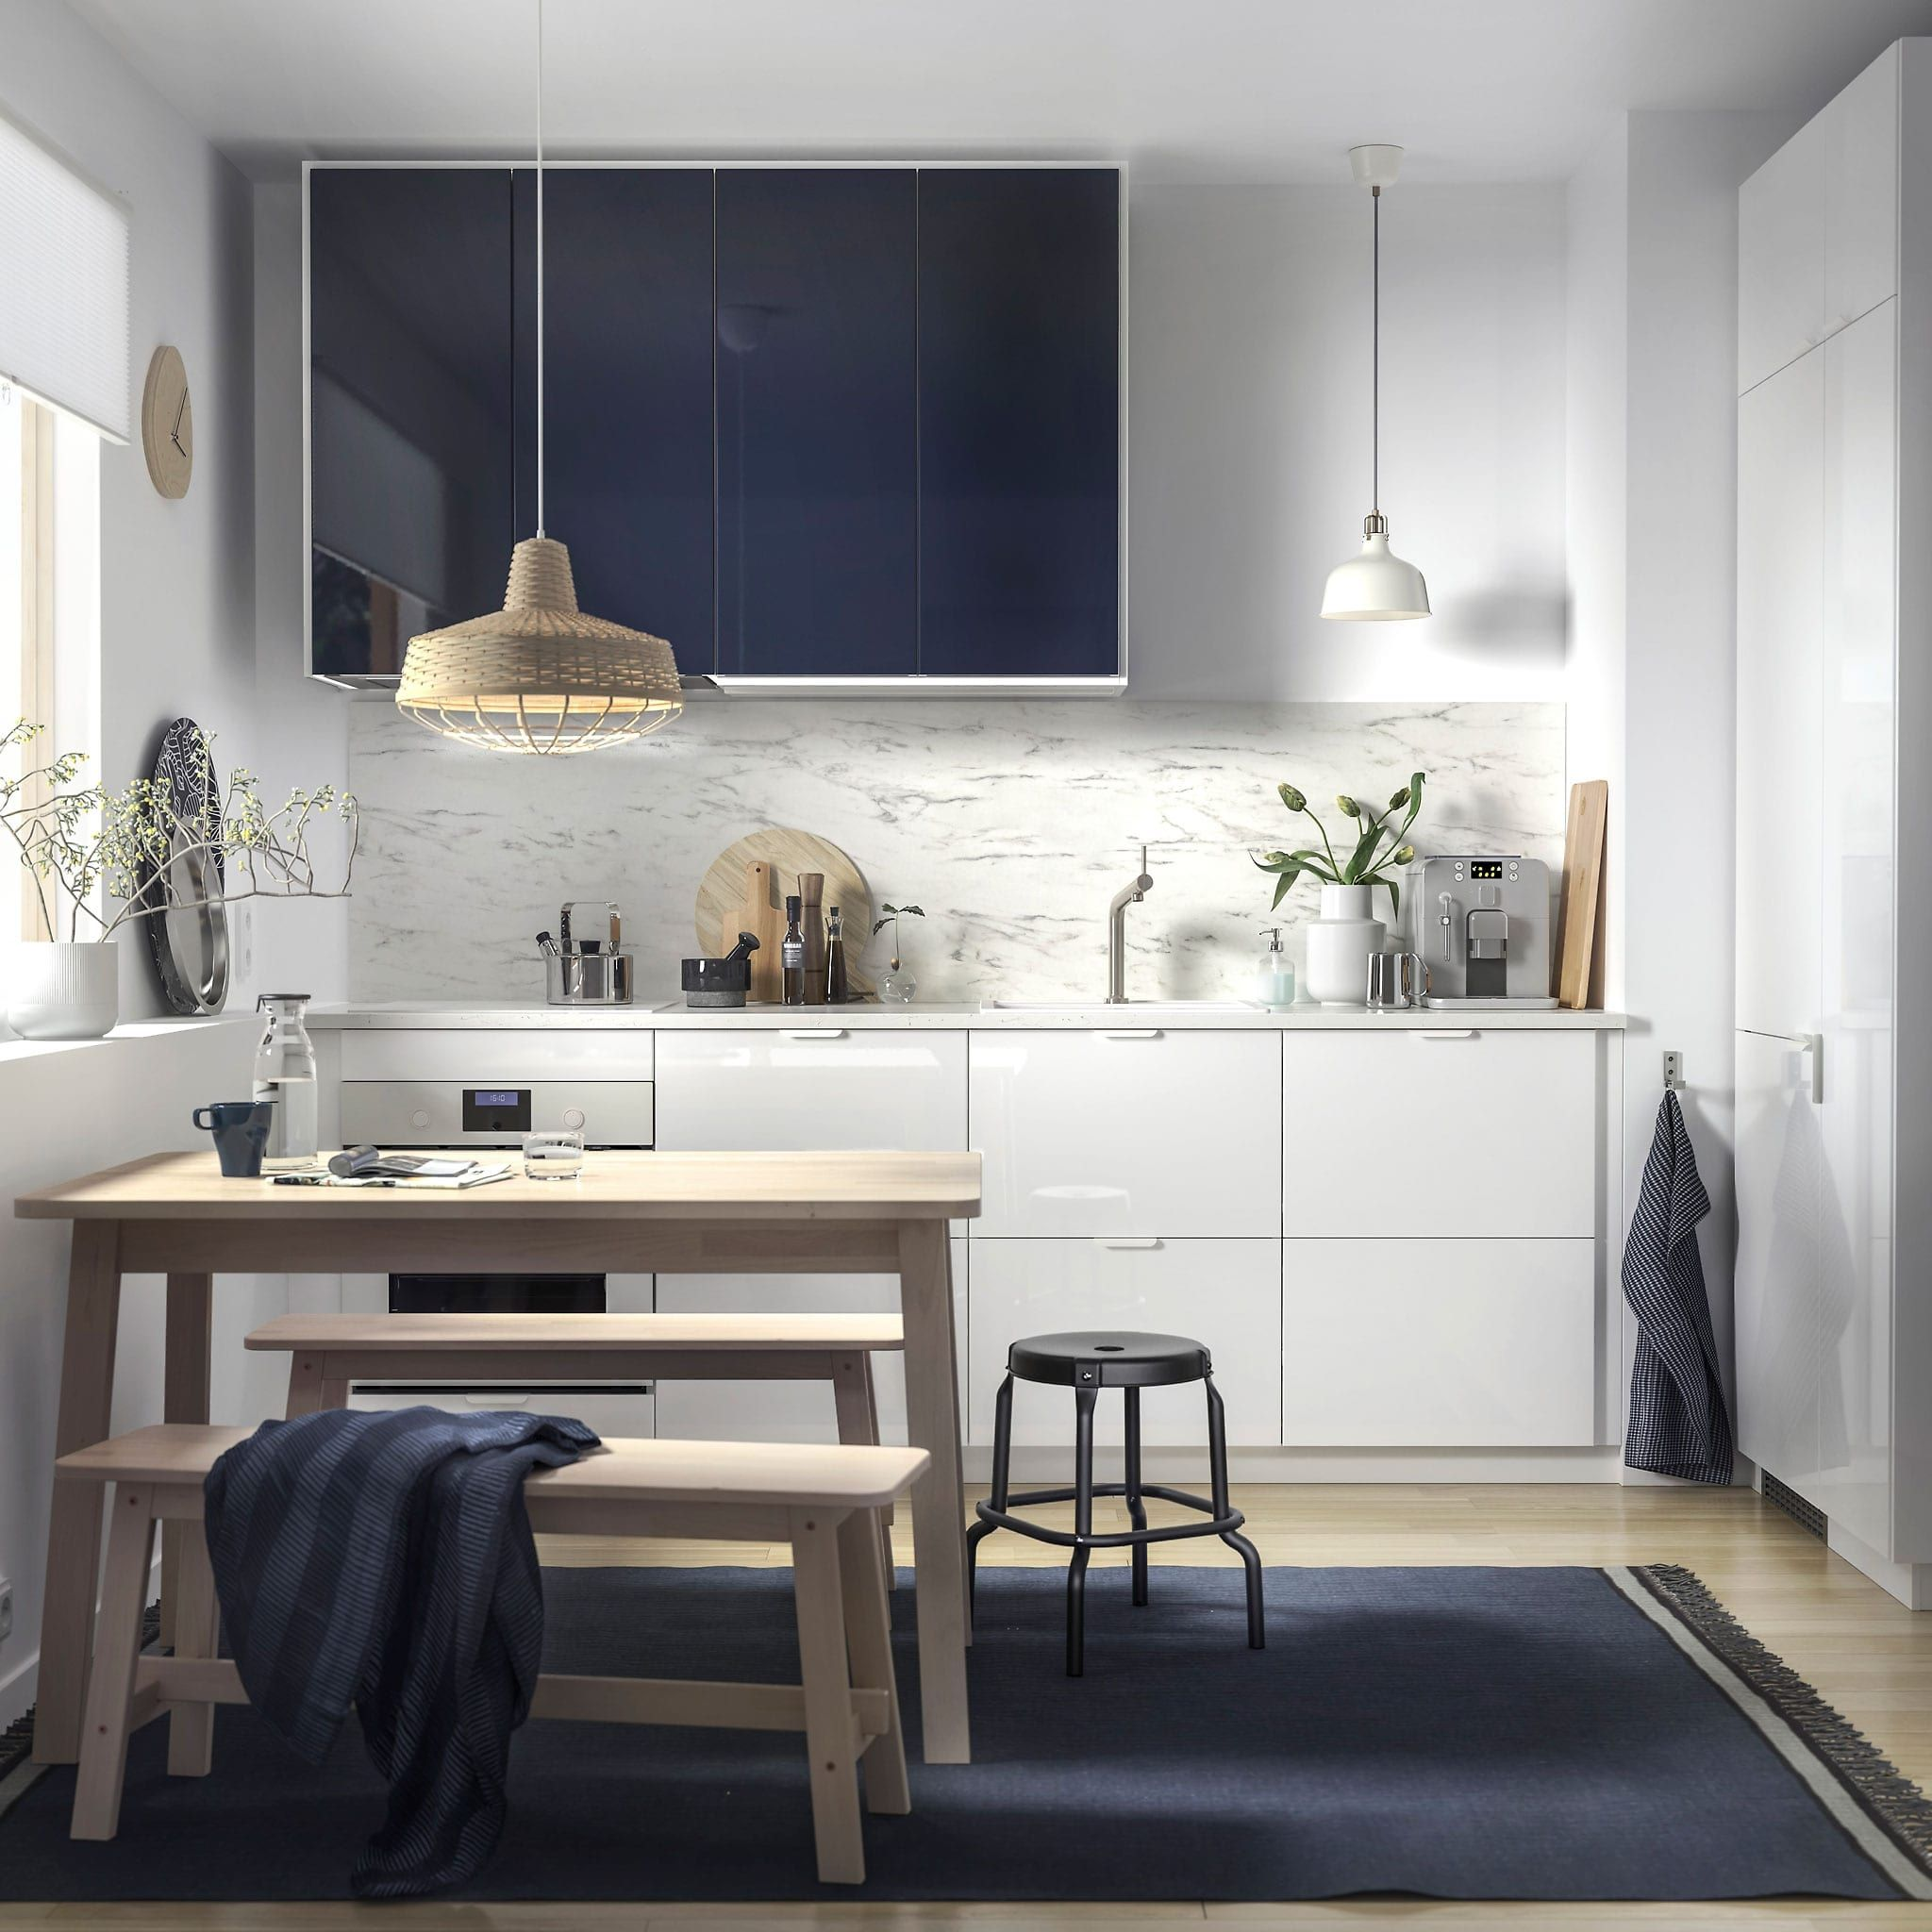 47+ Outstanding Gray Kitchen Flooring Frieze (med billeder